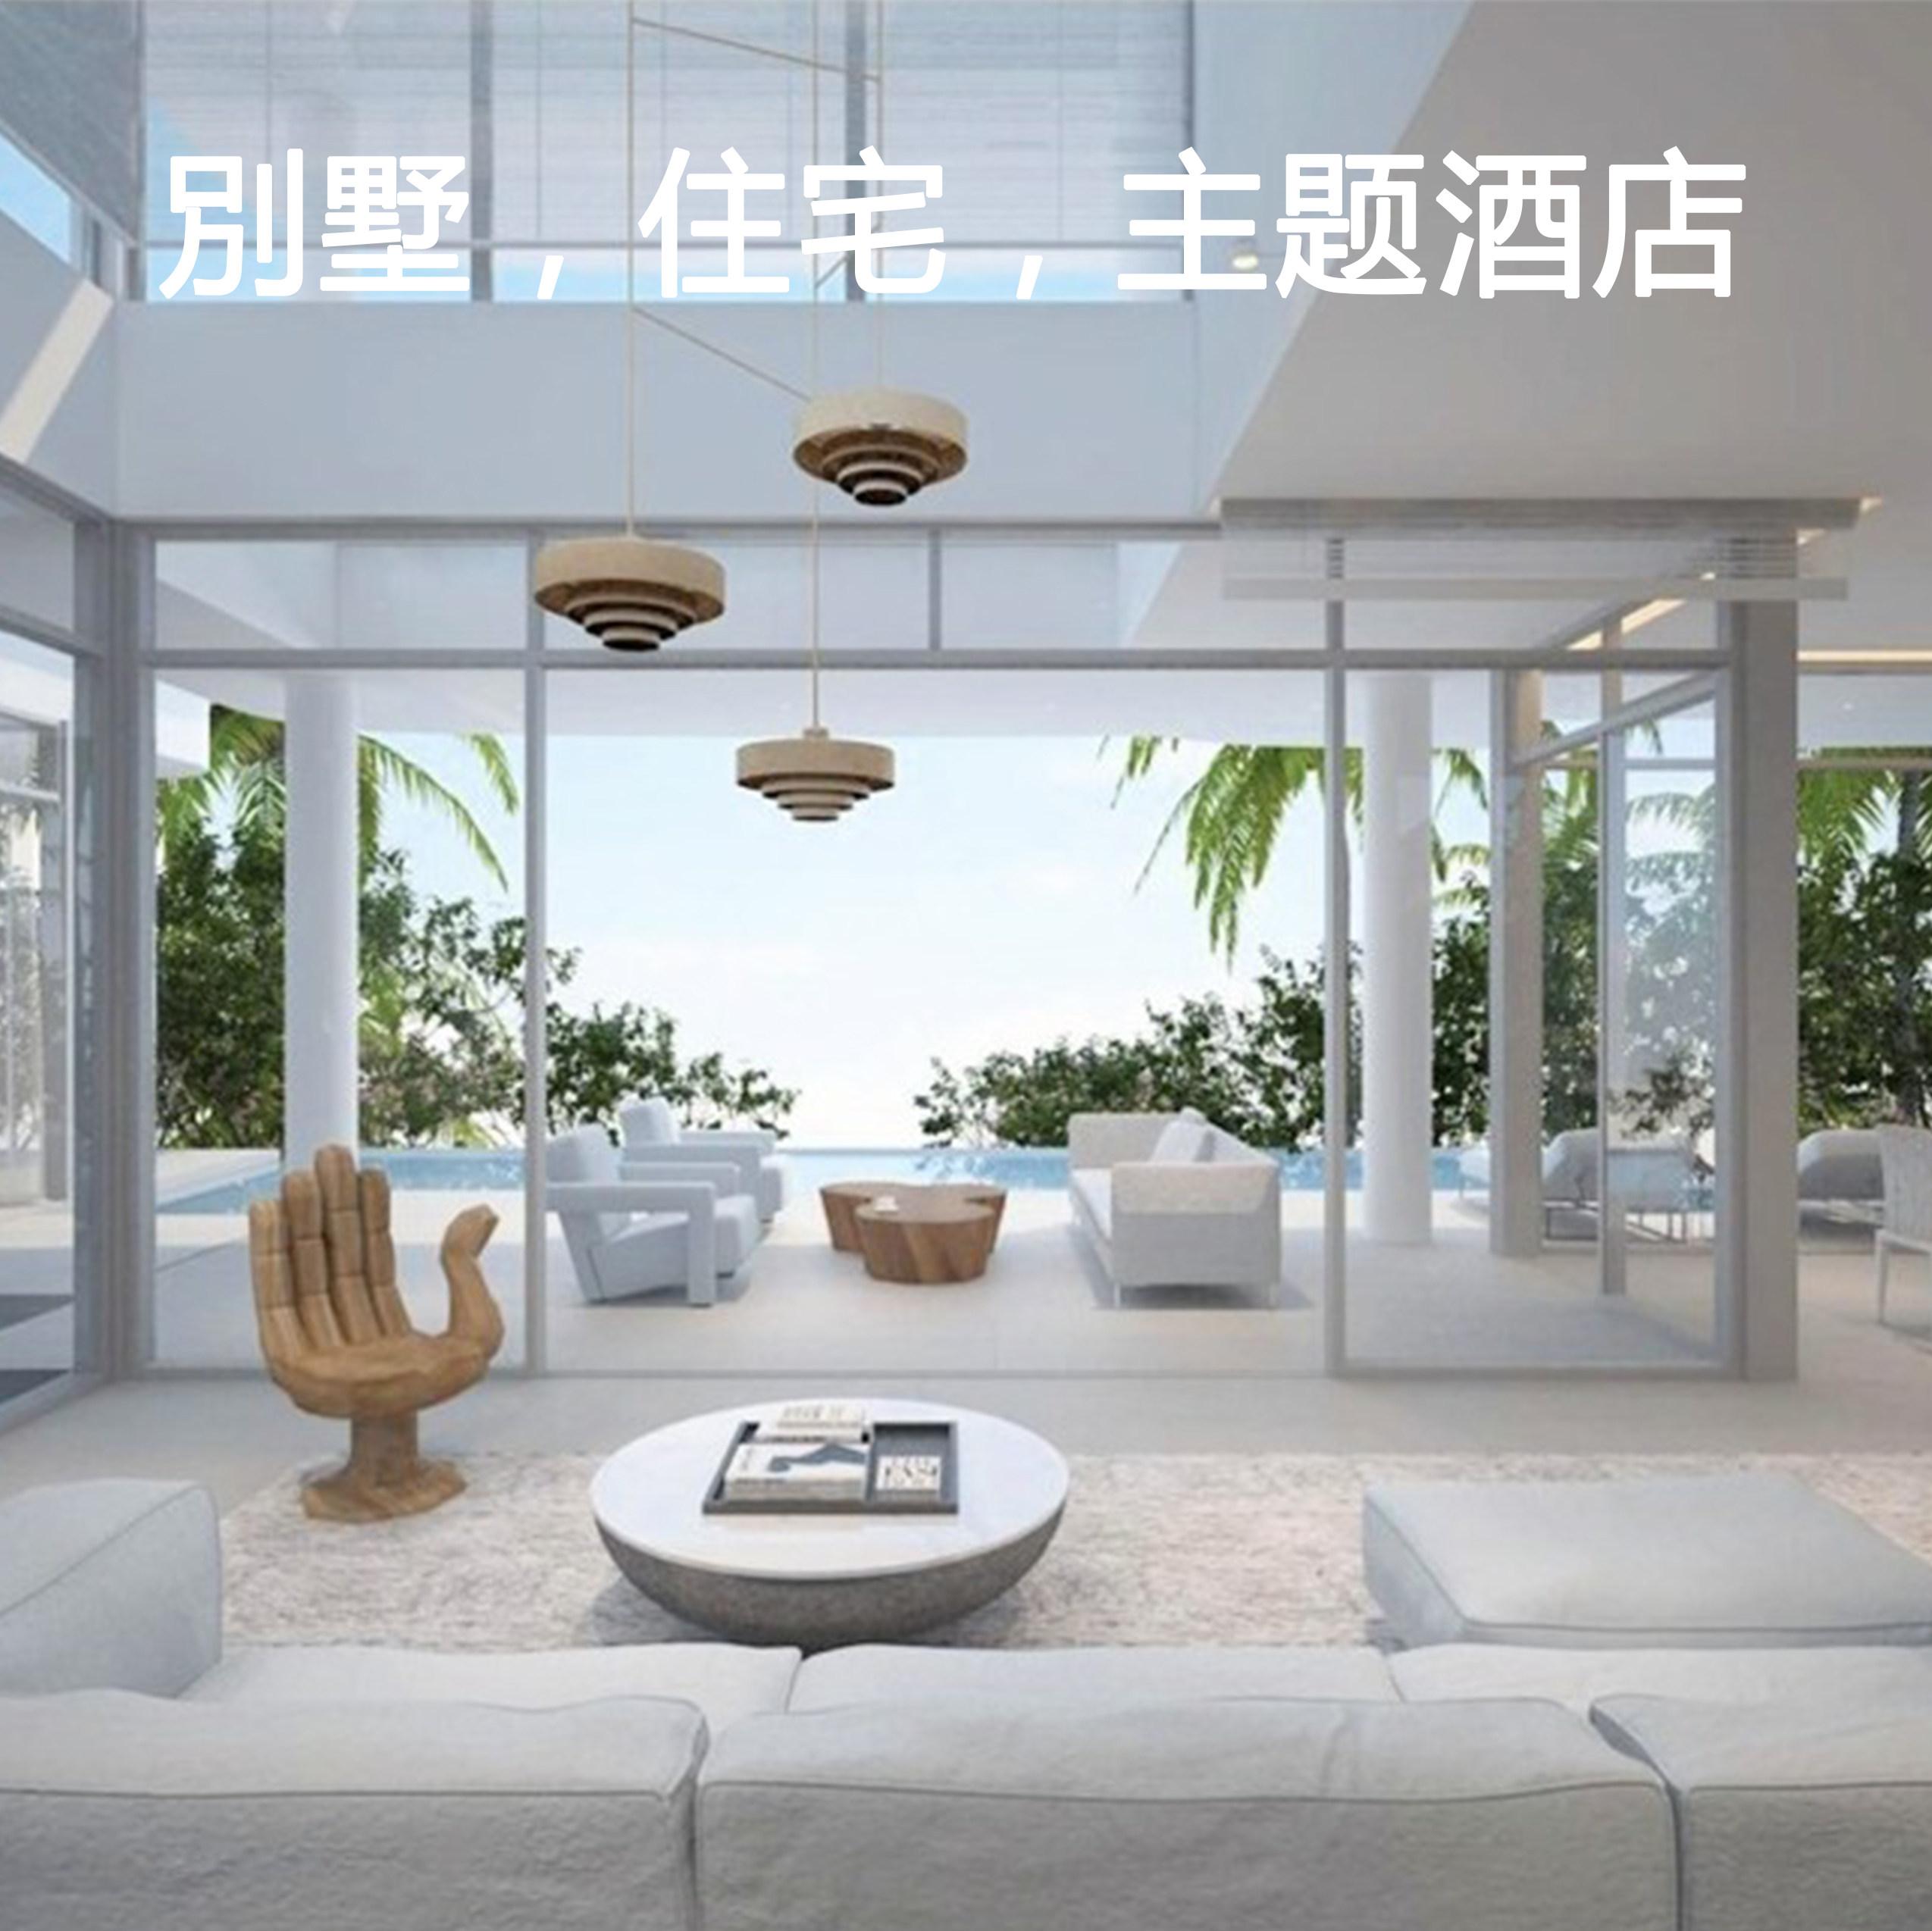 Villas, Condominiums,Bountique Hotel, Leisure Facilities, Art Gallery Lingshui, Hainan, China